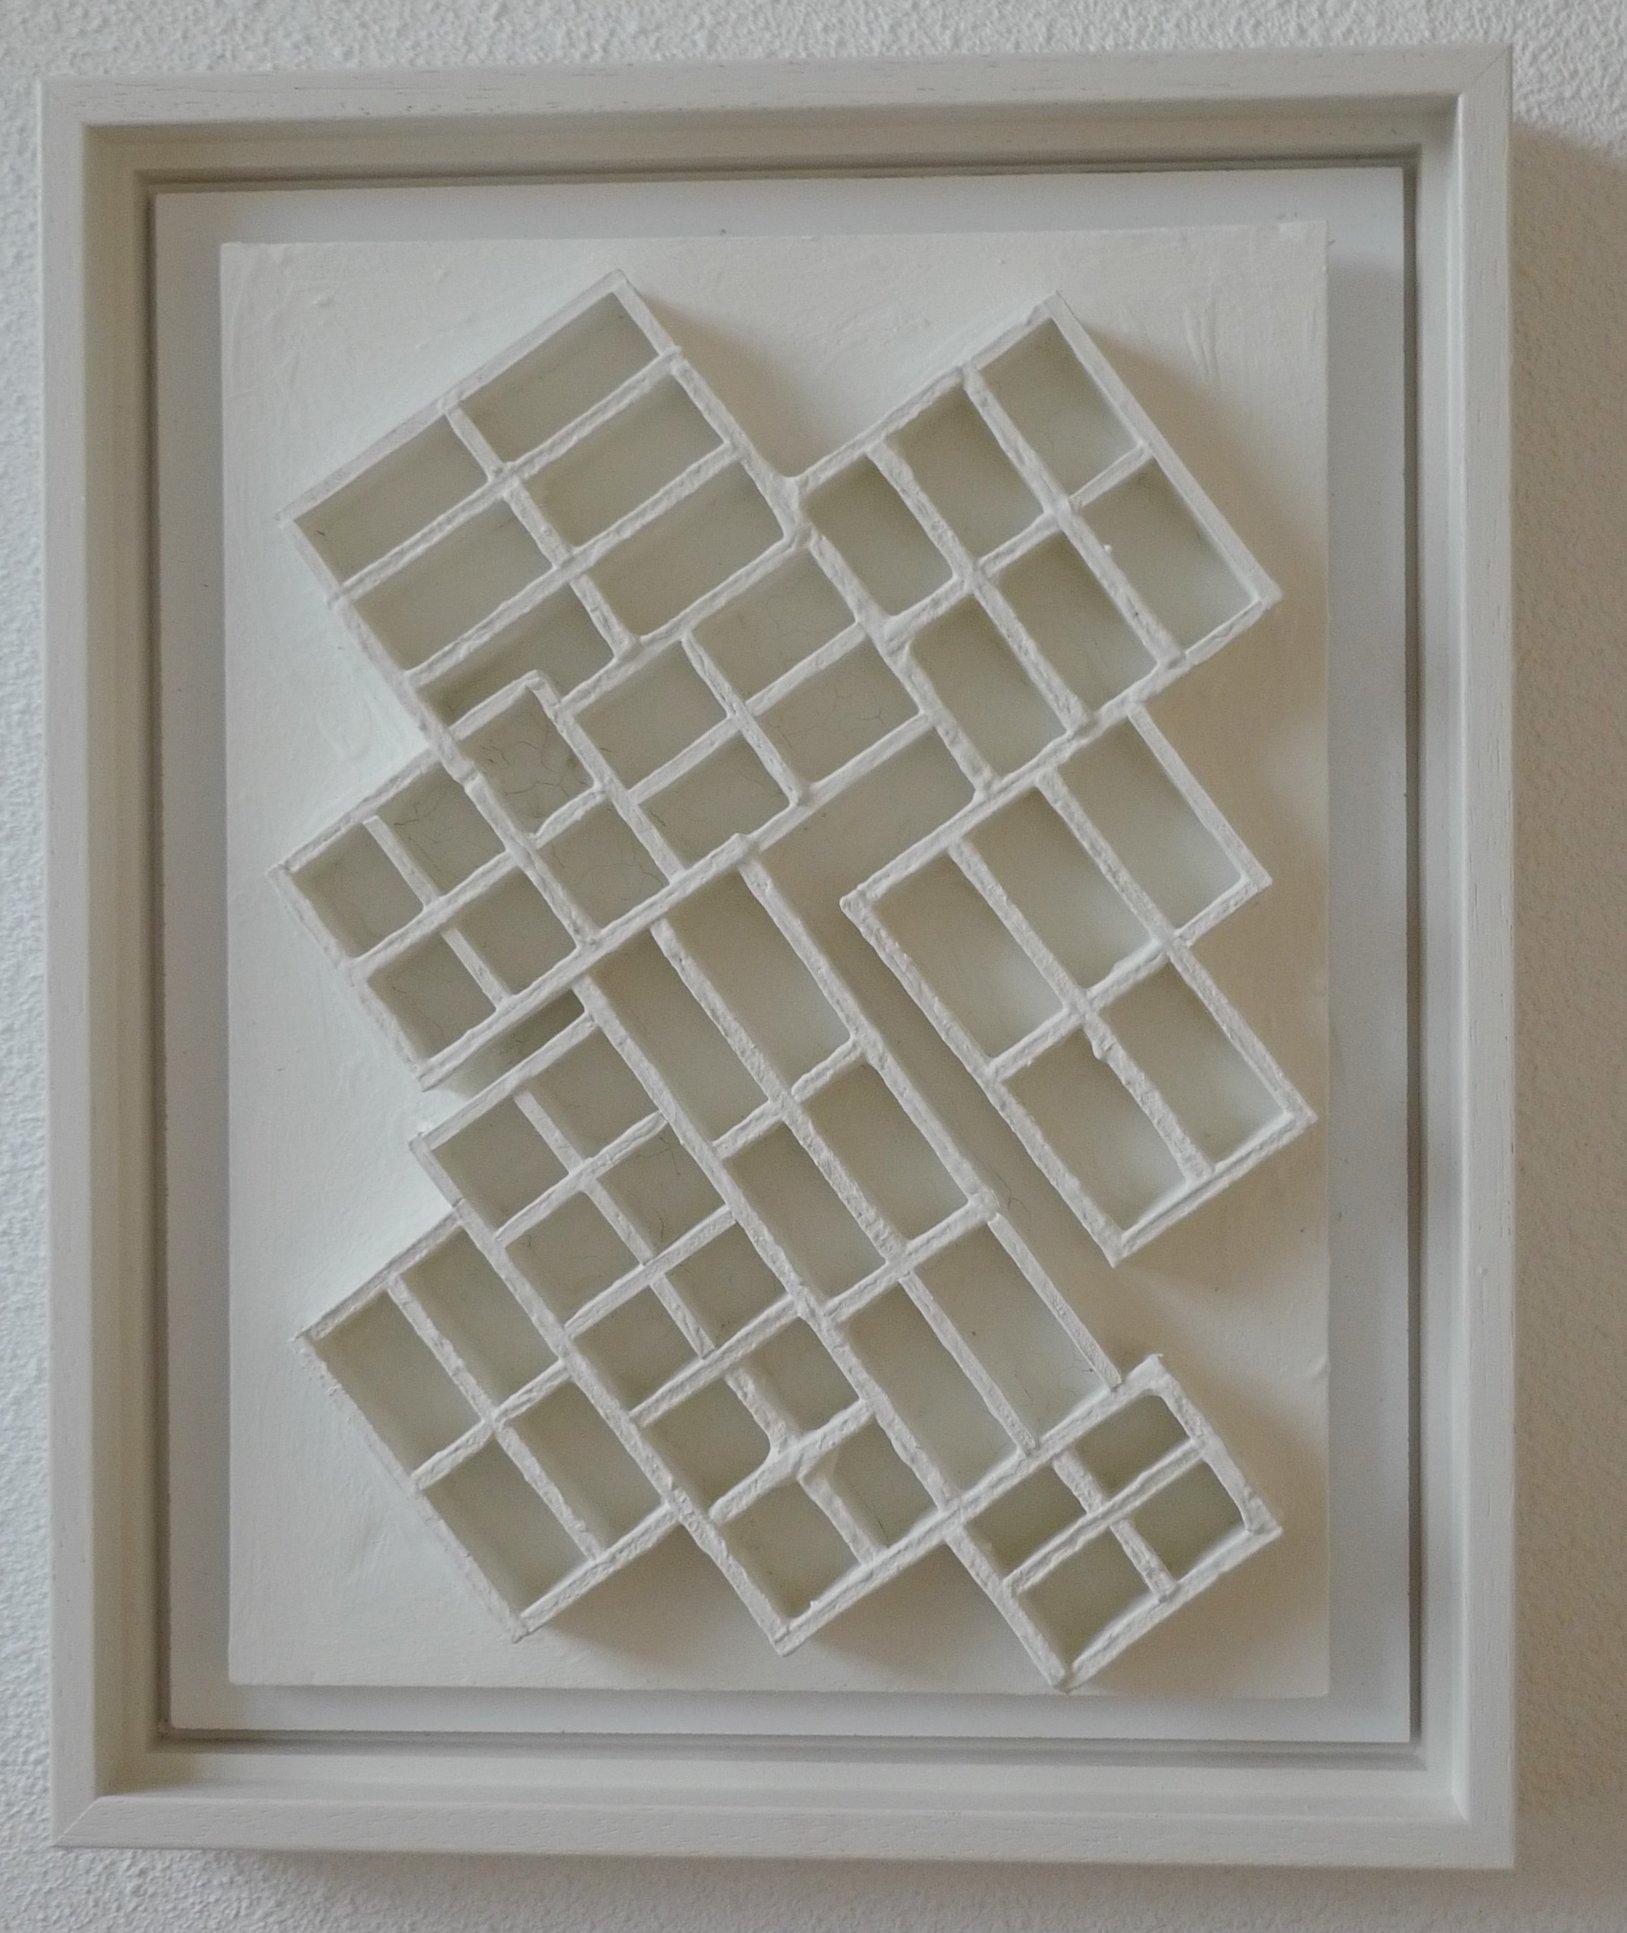 Maze 6 ('08-'09)